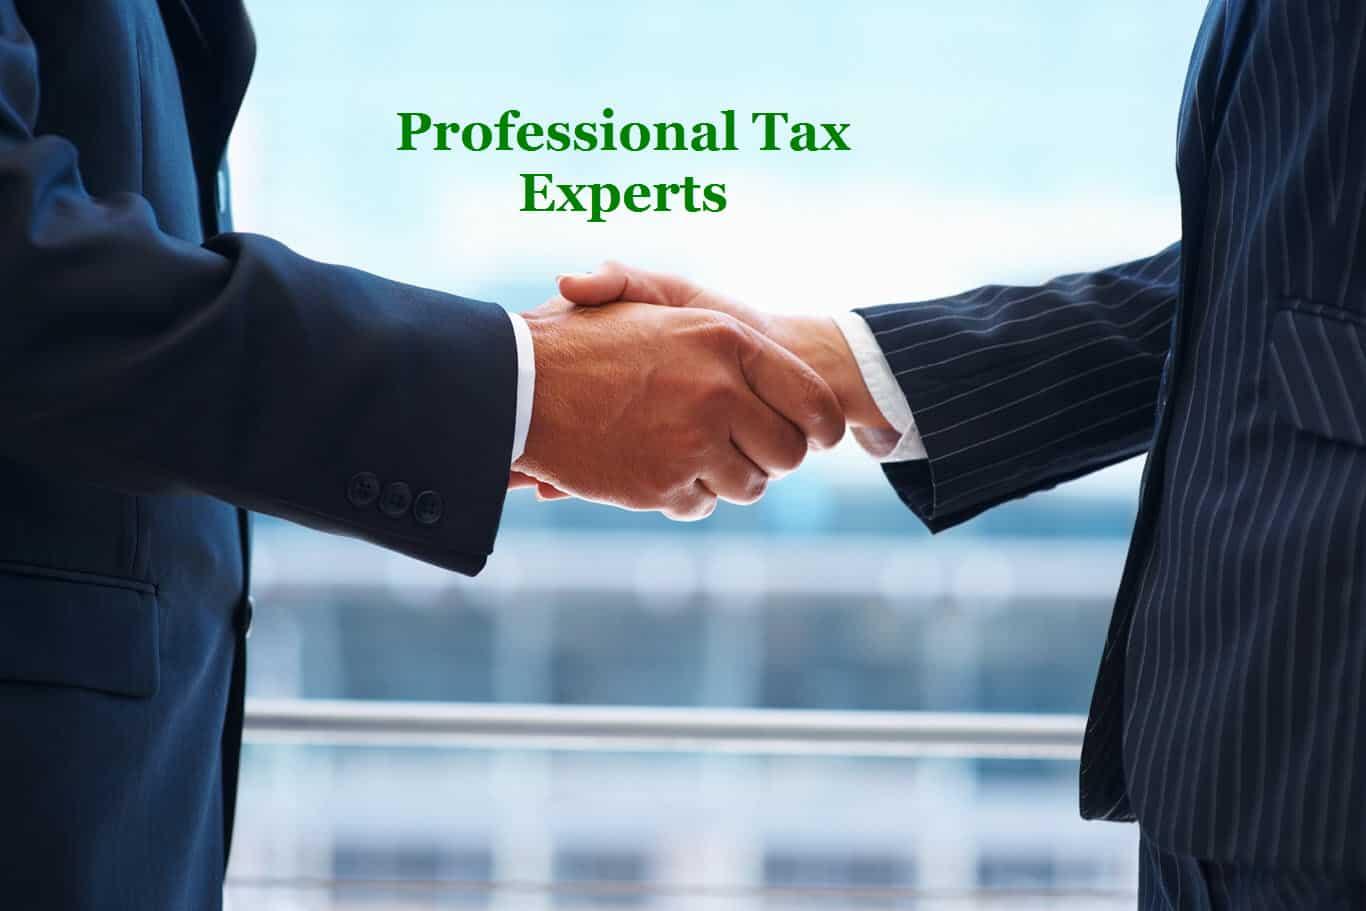 Professional Tax Experts